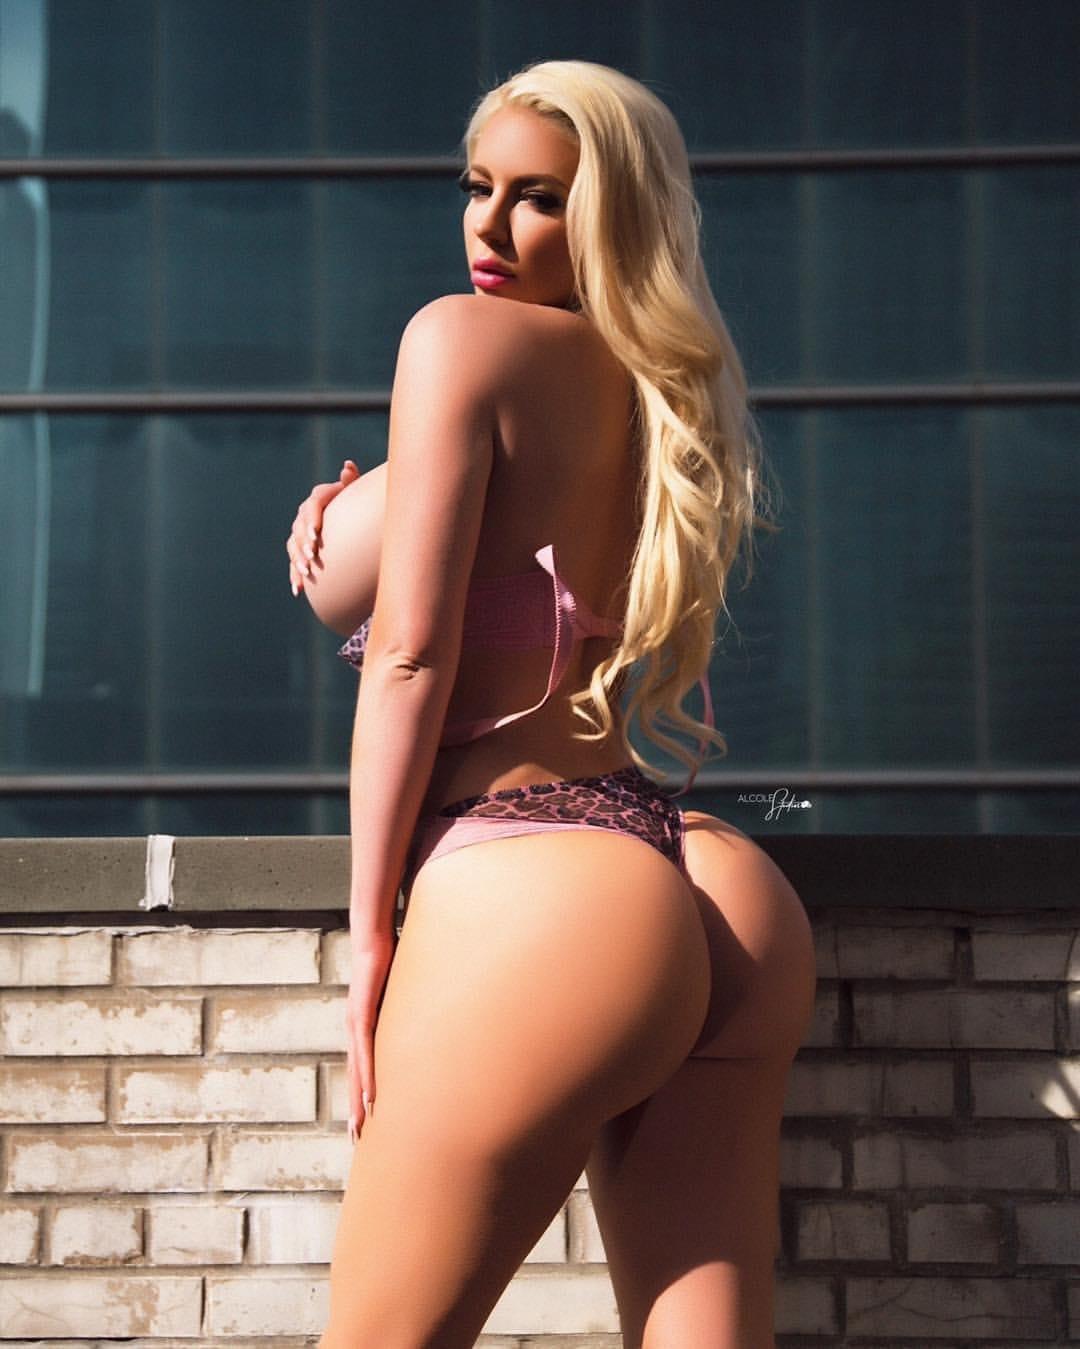 Nicolette Shea nude (94 fotos), hacked Tits, iCloud, butt 2017